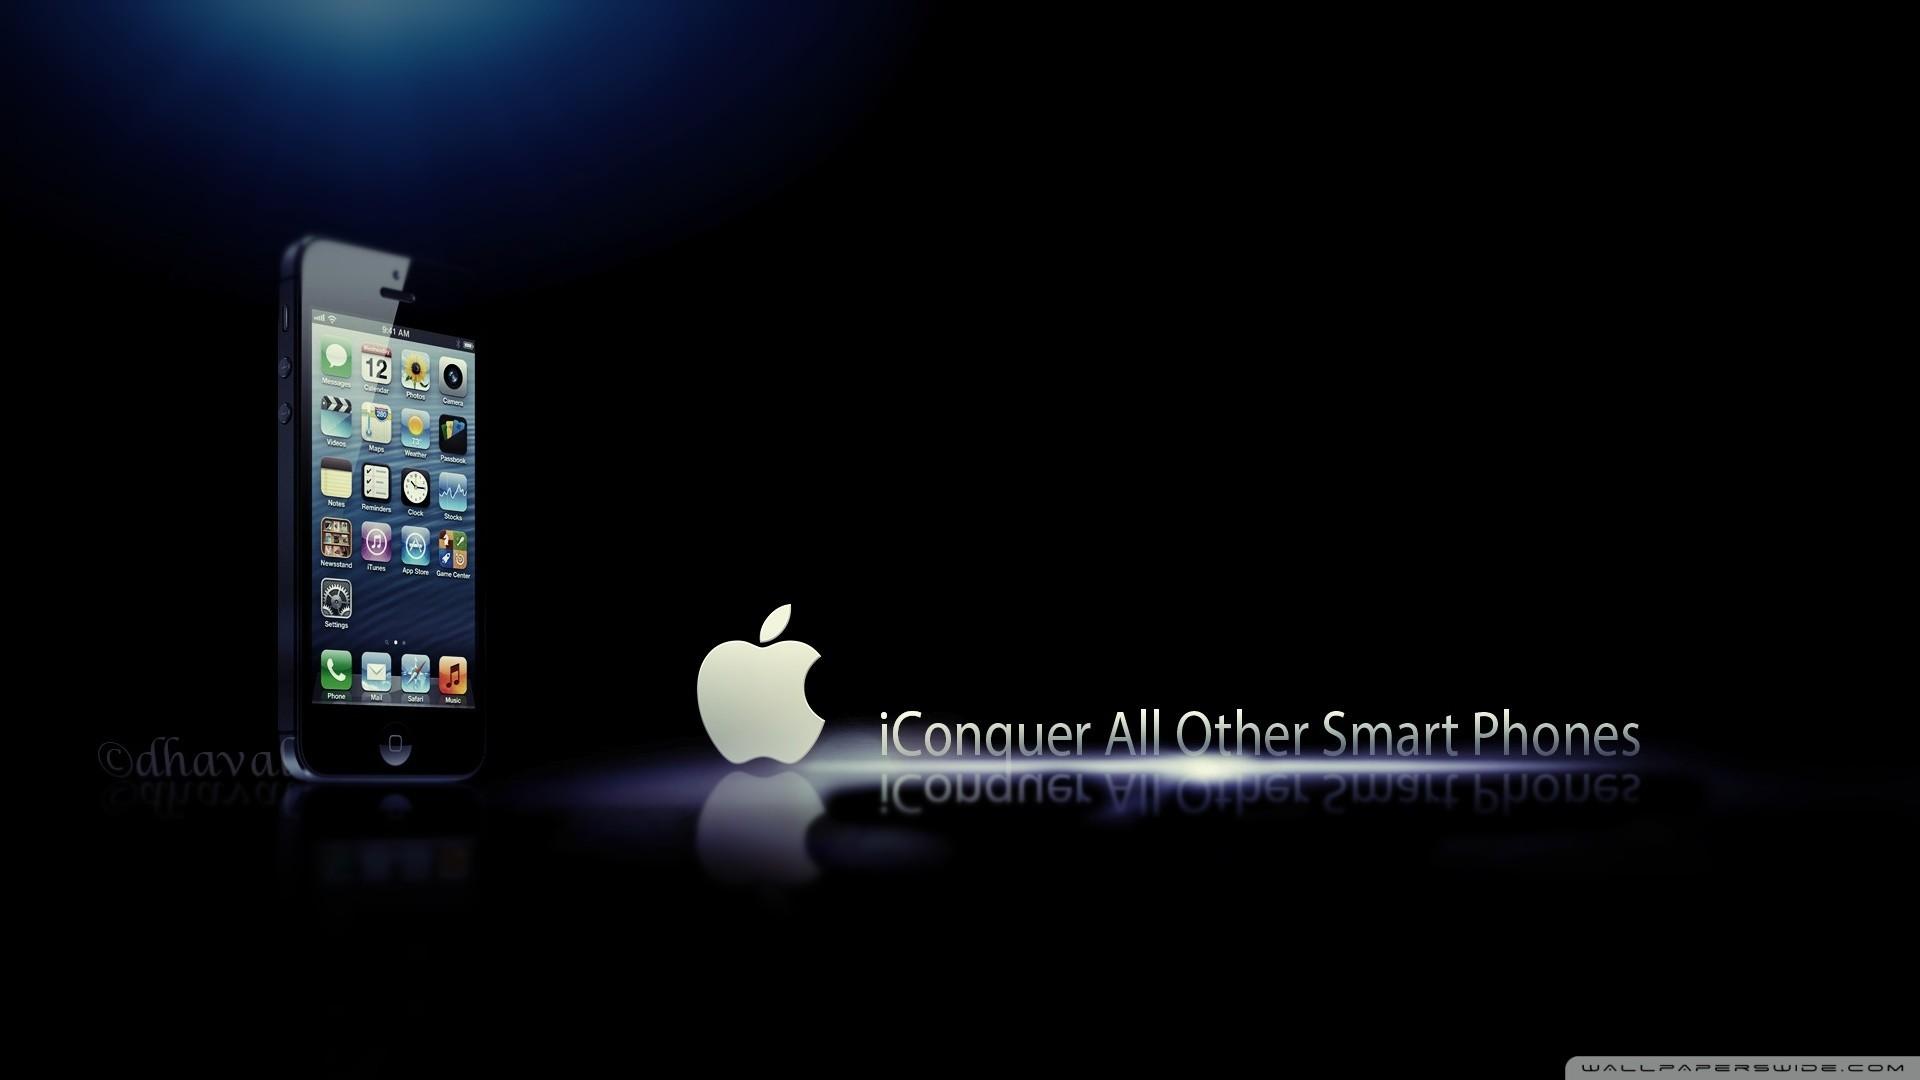 4. iphone-5-wallpaper4-600×338